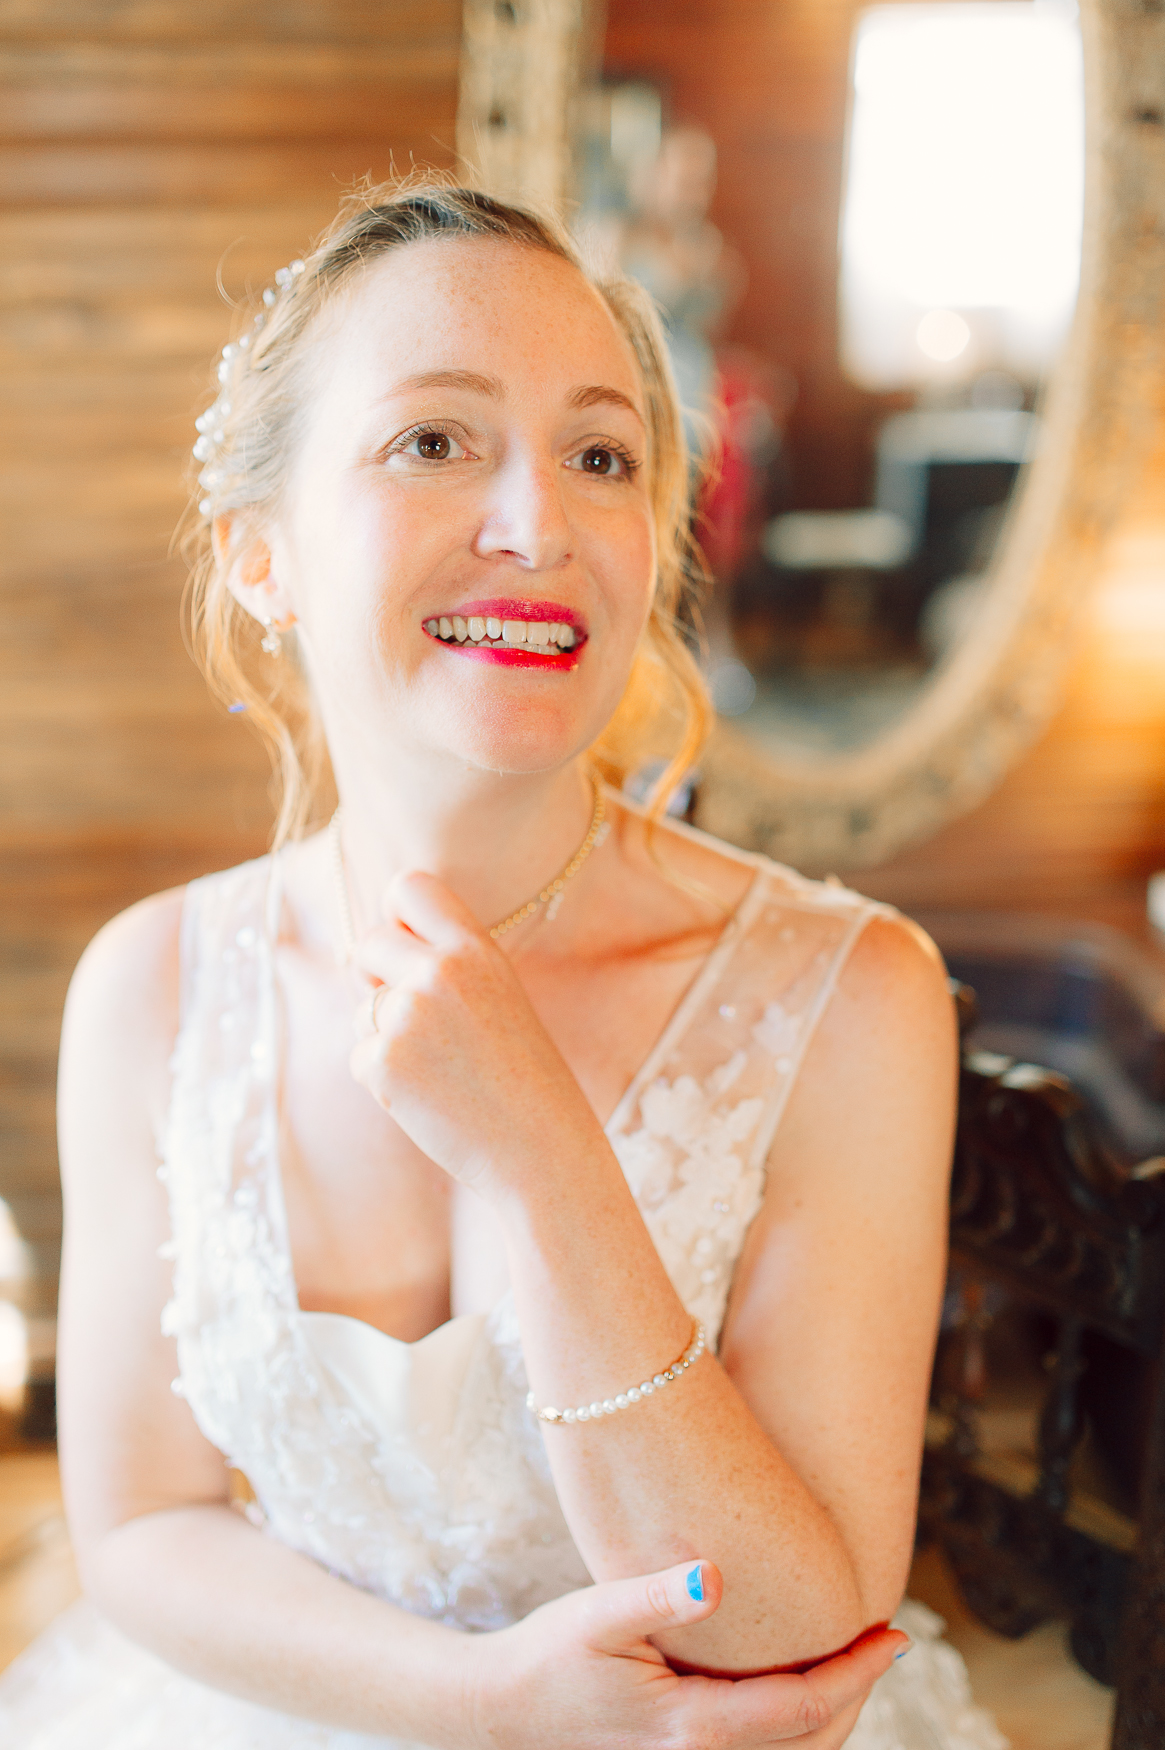 virginiawedding_theGlasgowFarm_rusticwedding_fredericksburg_youseephotography_CarolineDale (25).jpg